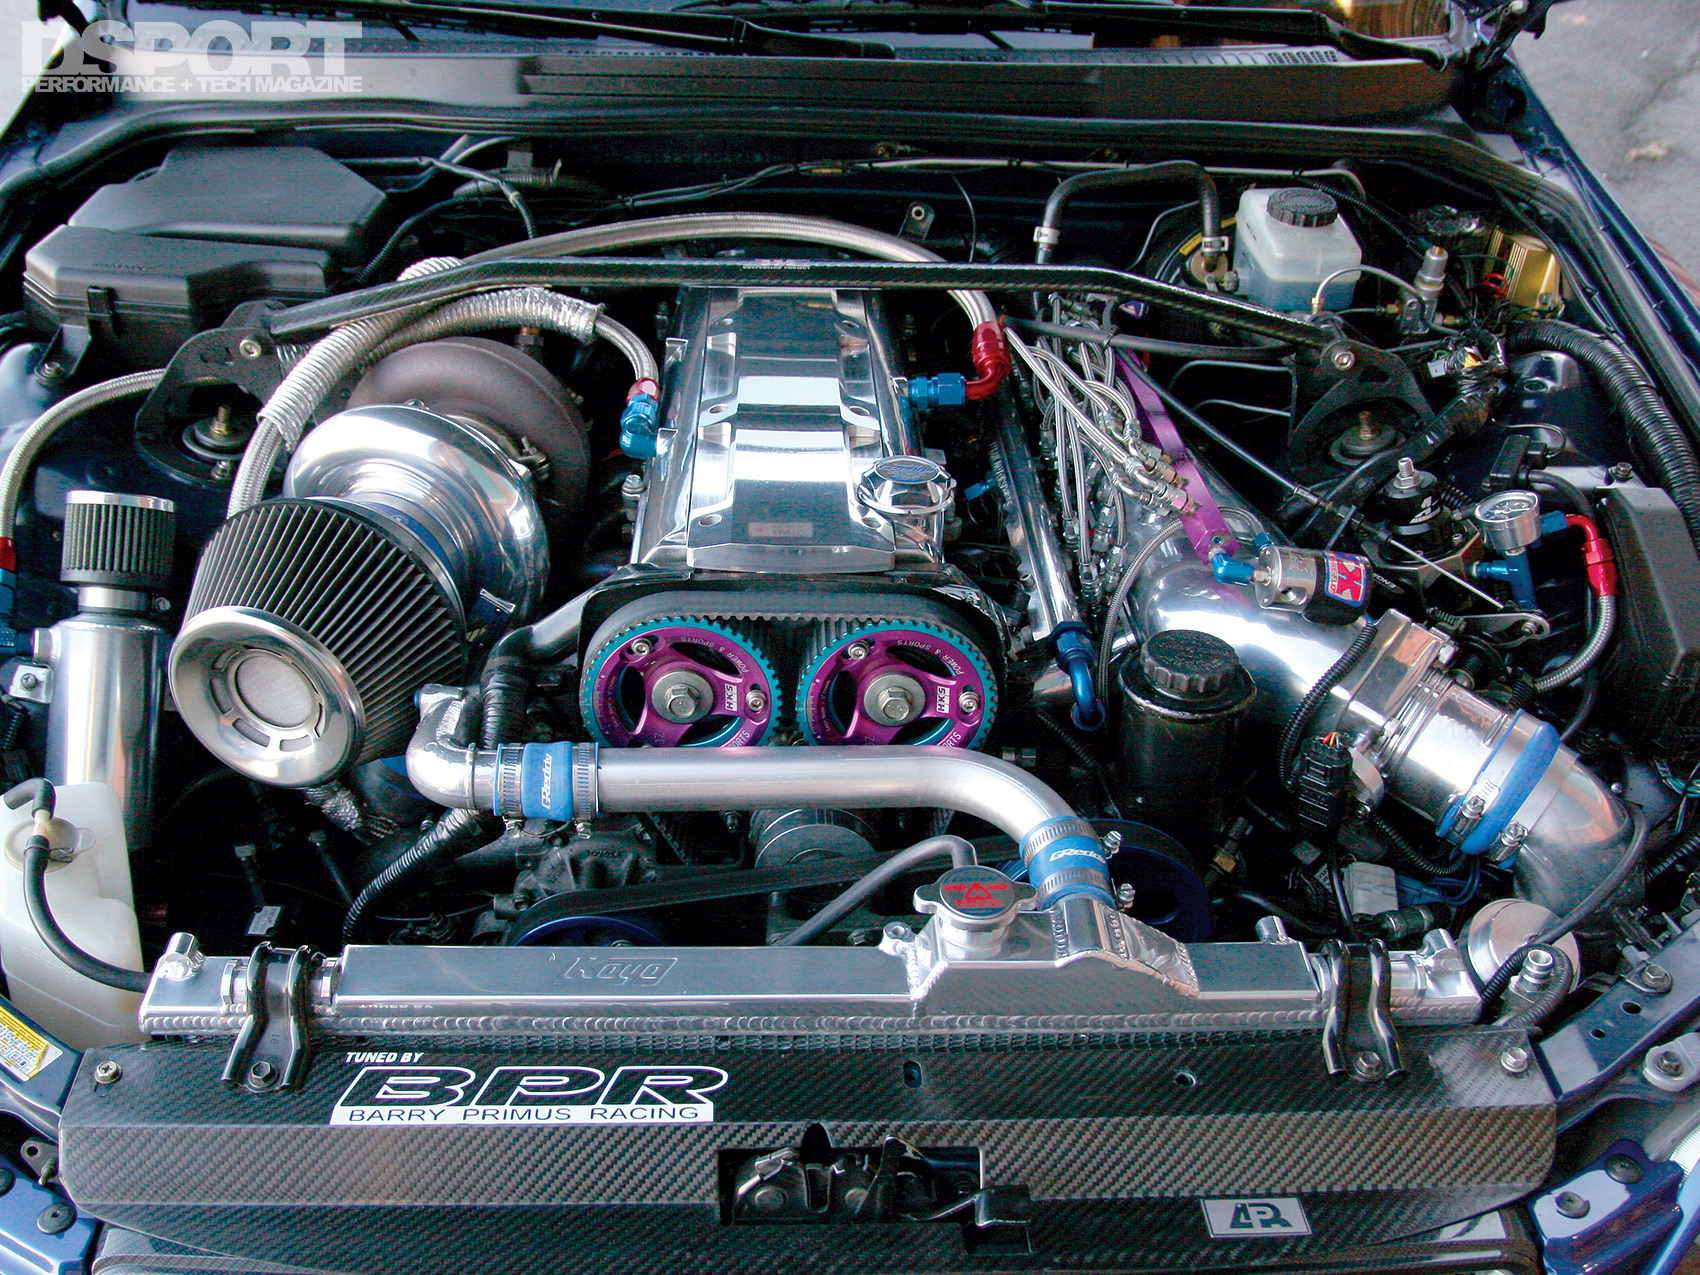 1,036 WHP 2JZ Powered Lexus IS300